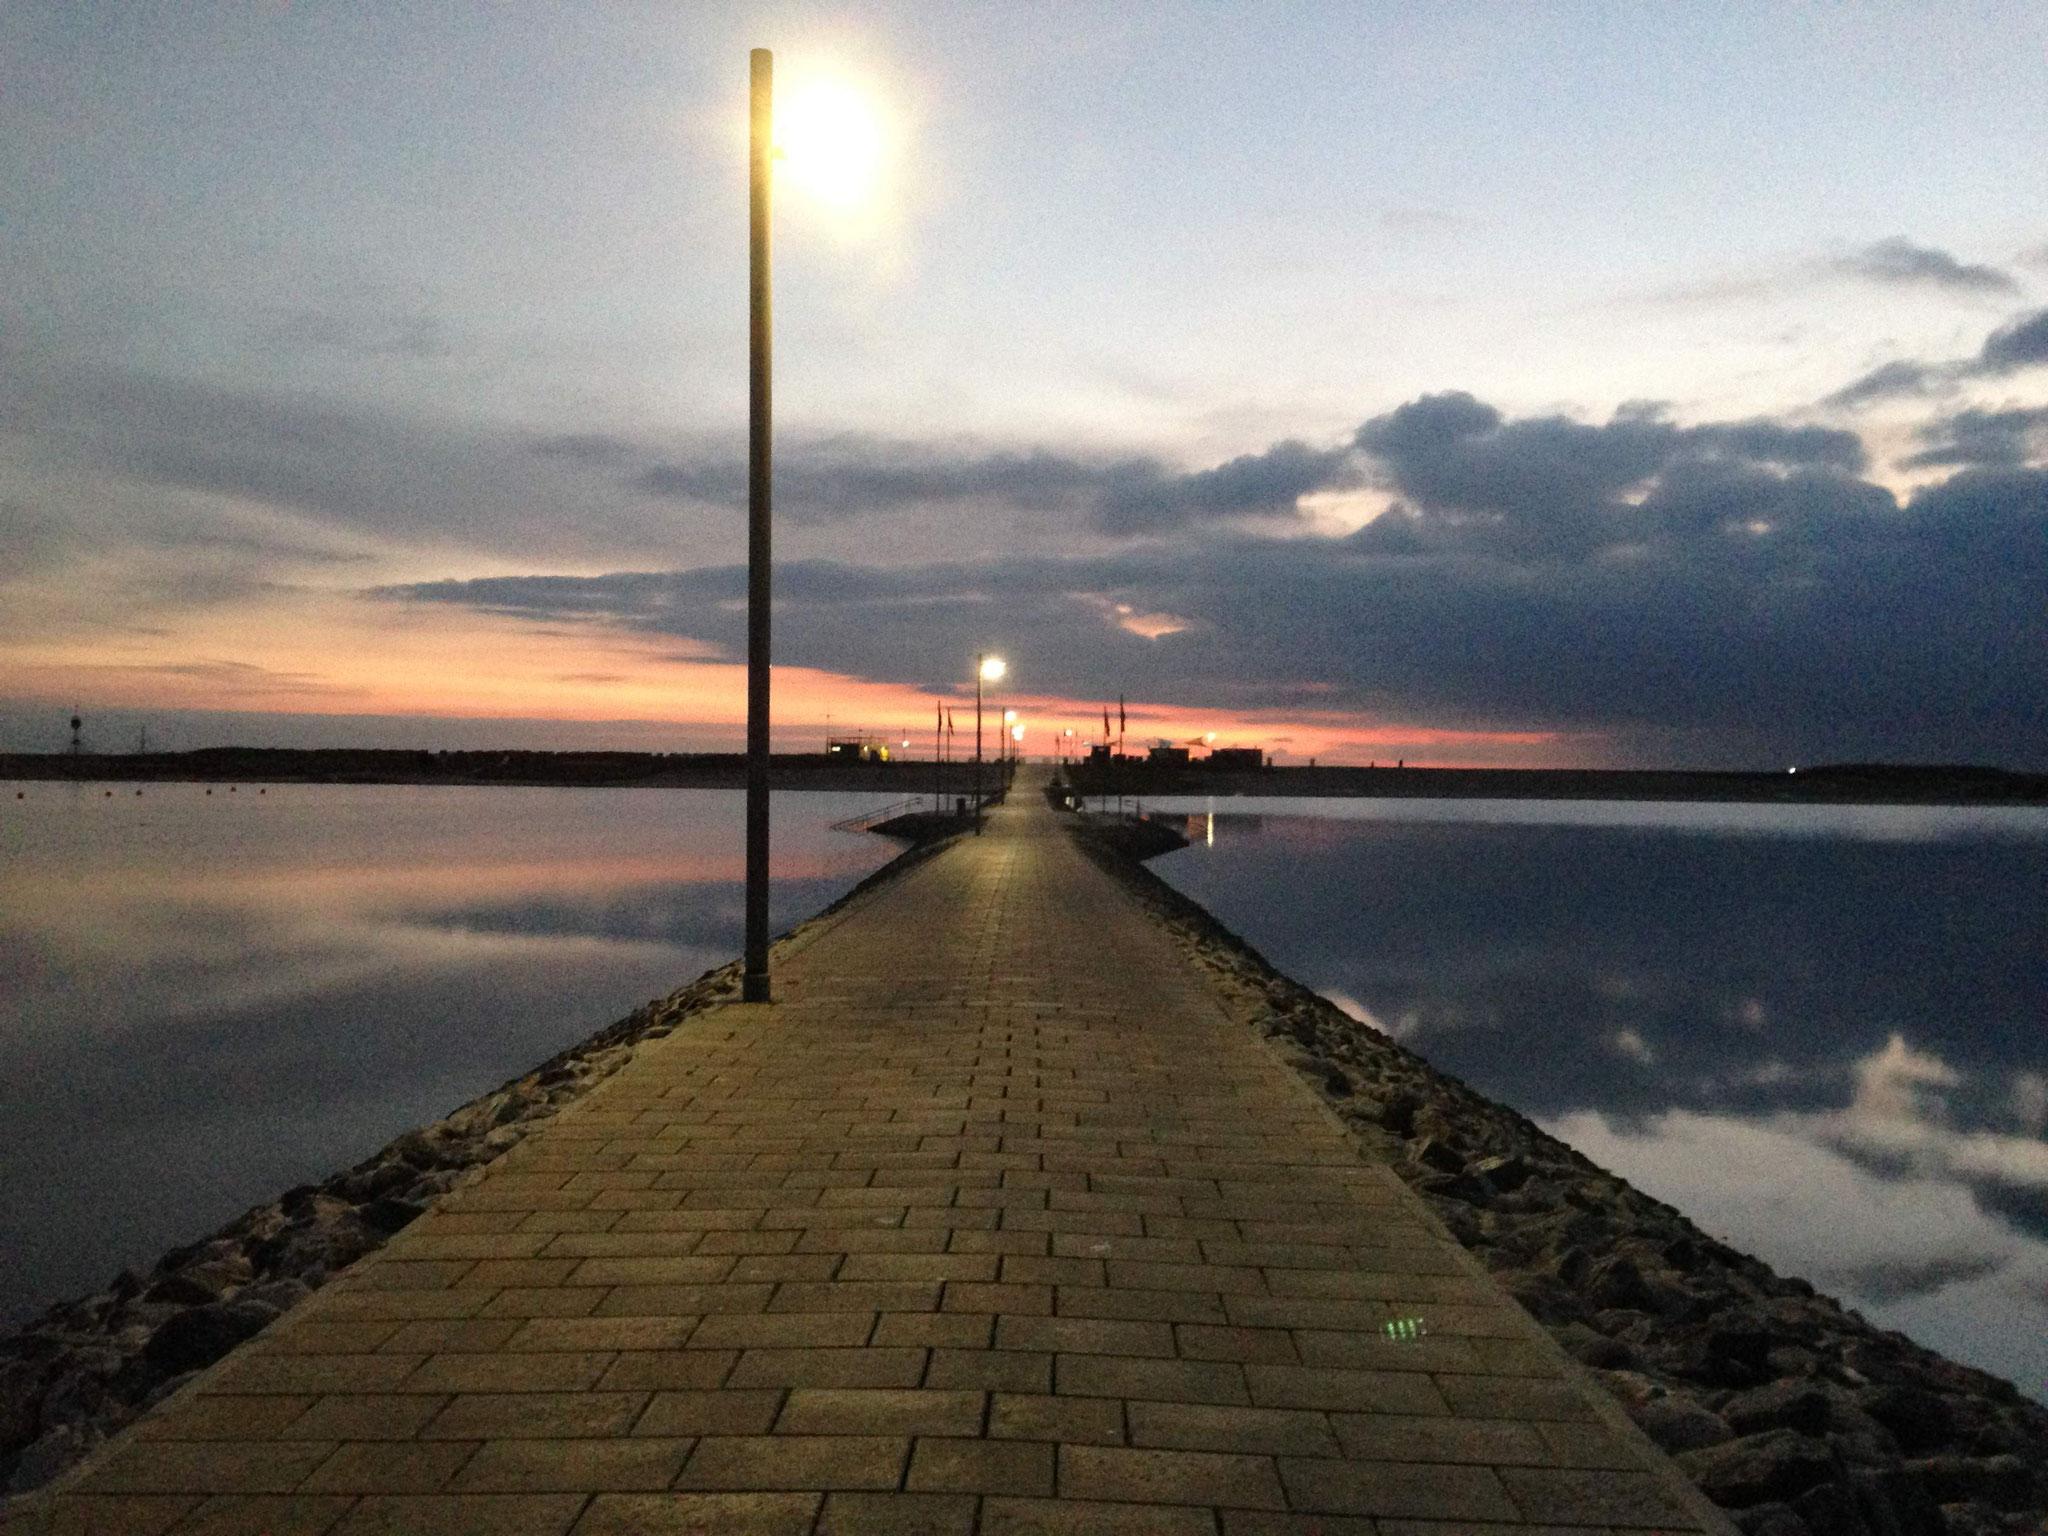 Jhamala's NAT(O)URs - Nordsee 9